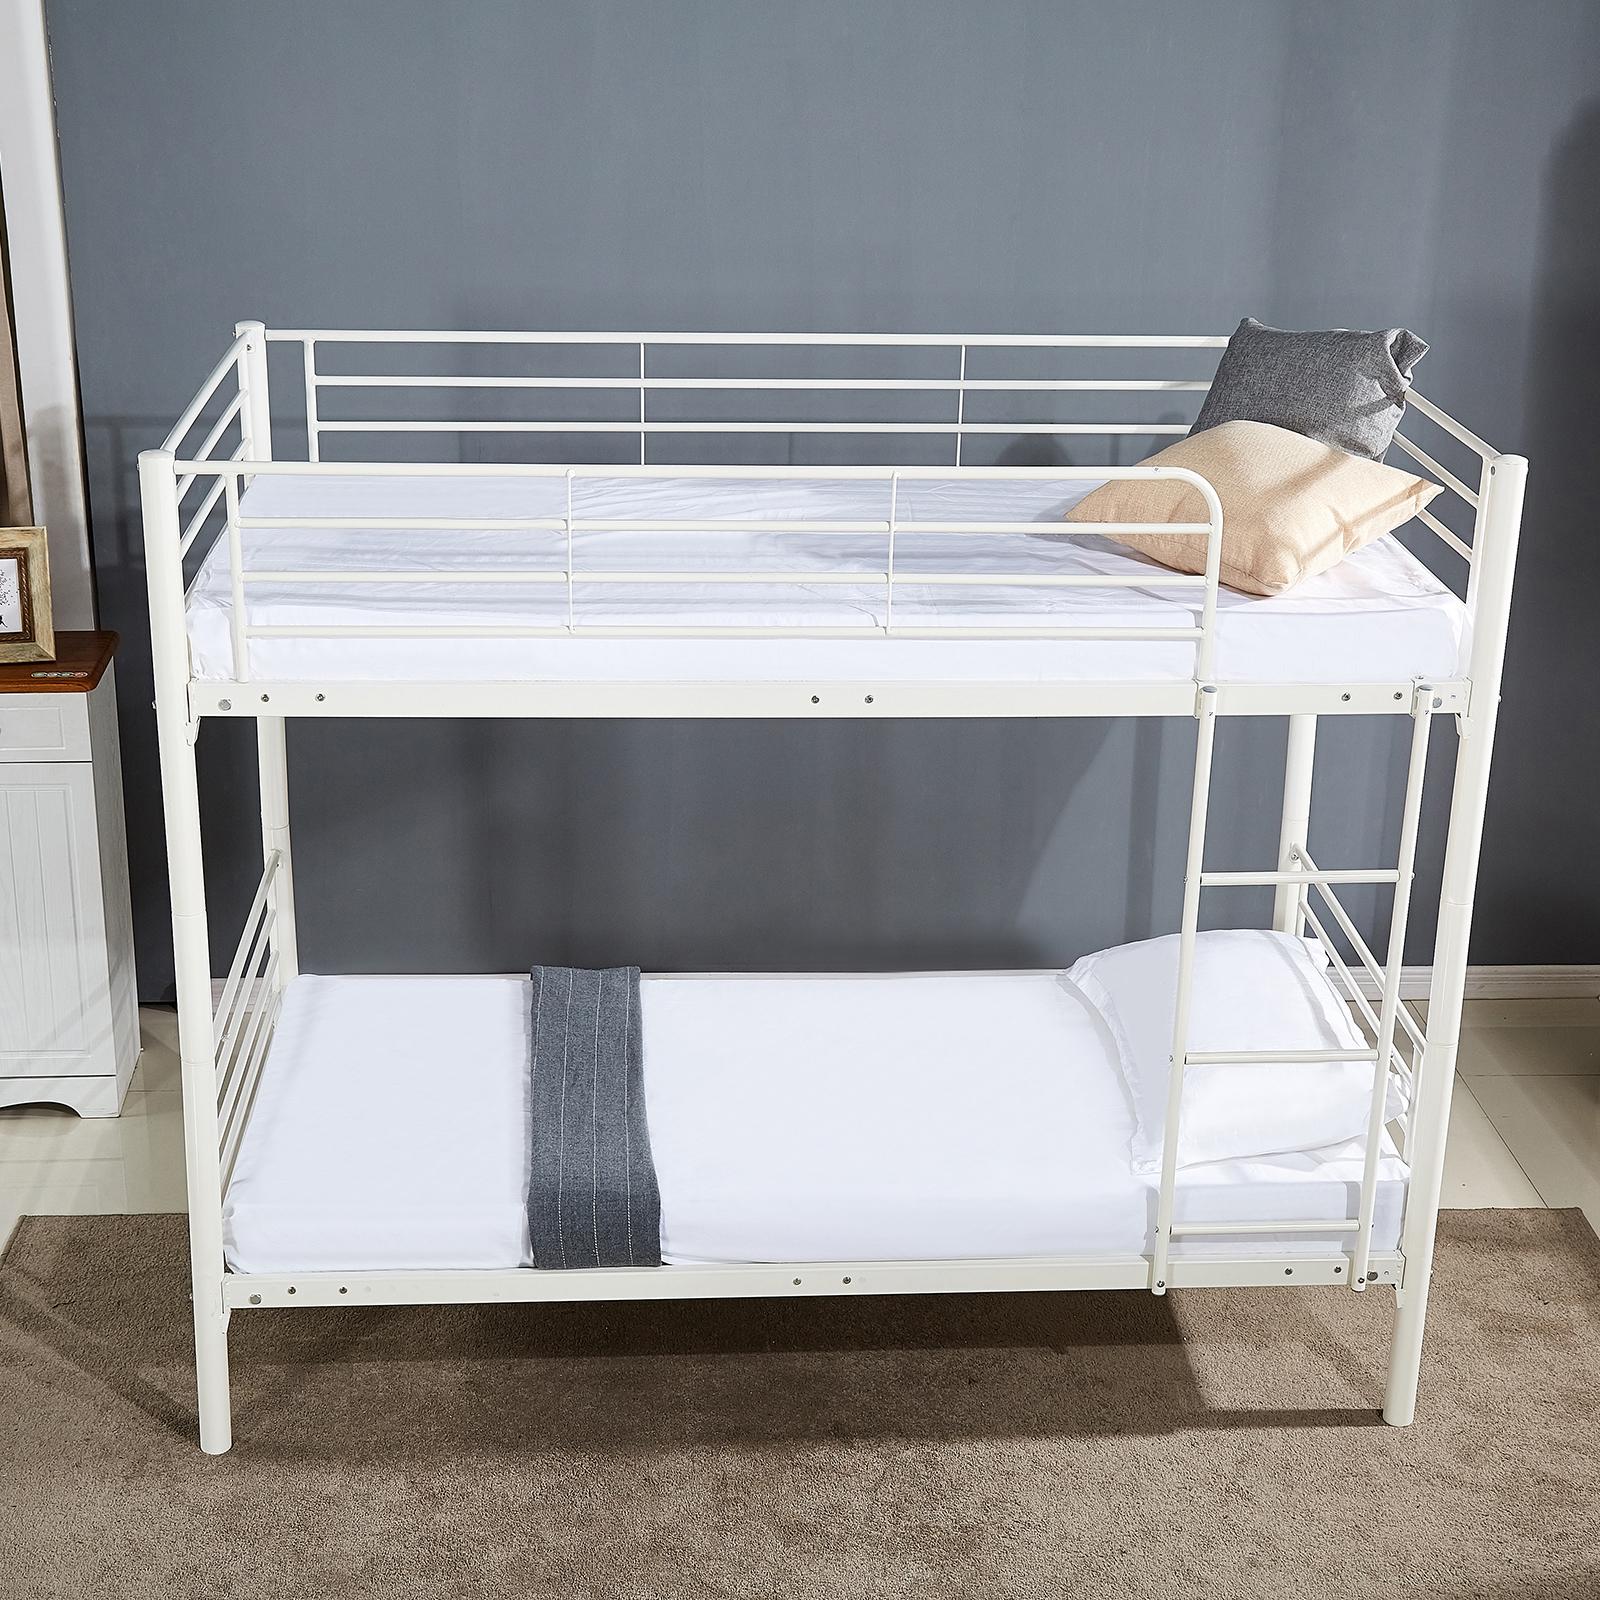 Metal Twin Over Twin Size Bunk Bed Frame Platform Ladder